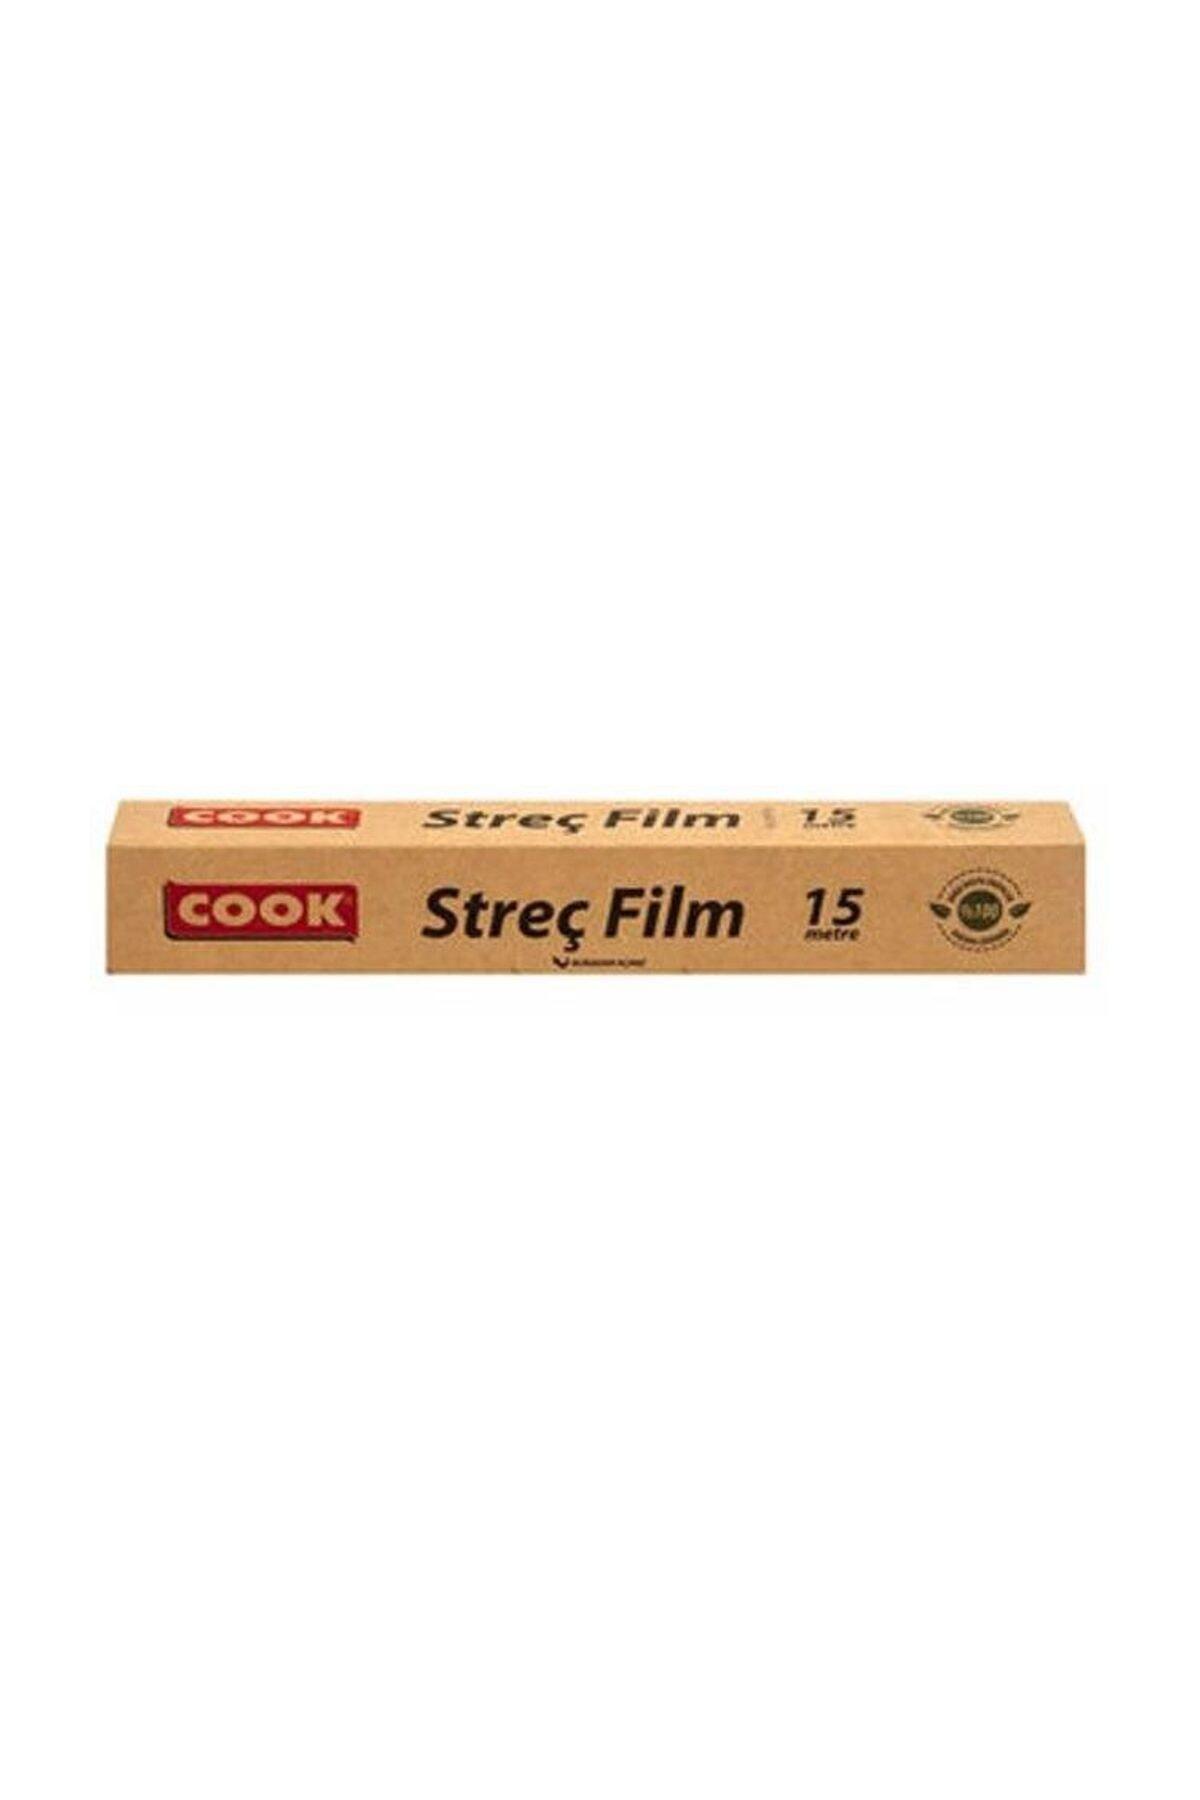 COOK DOGAL STREC FILM 15 M